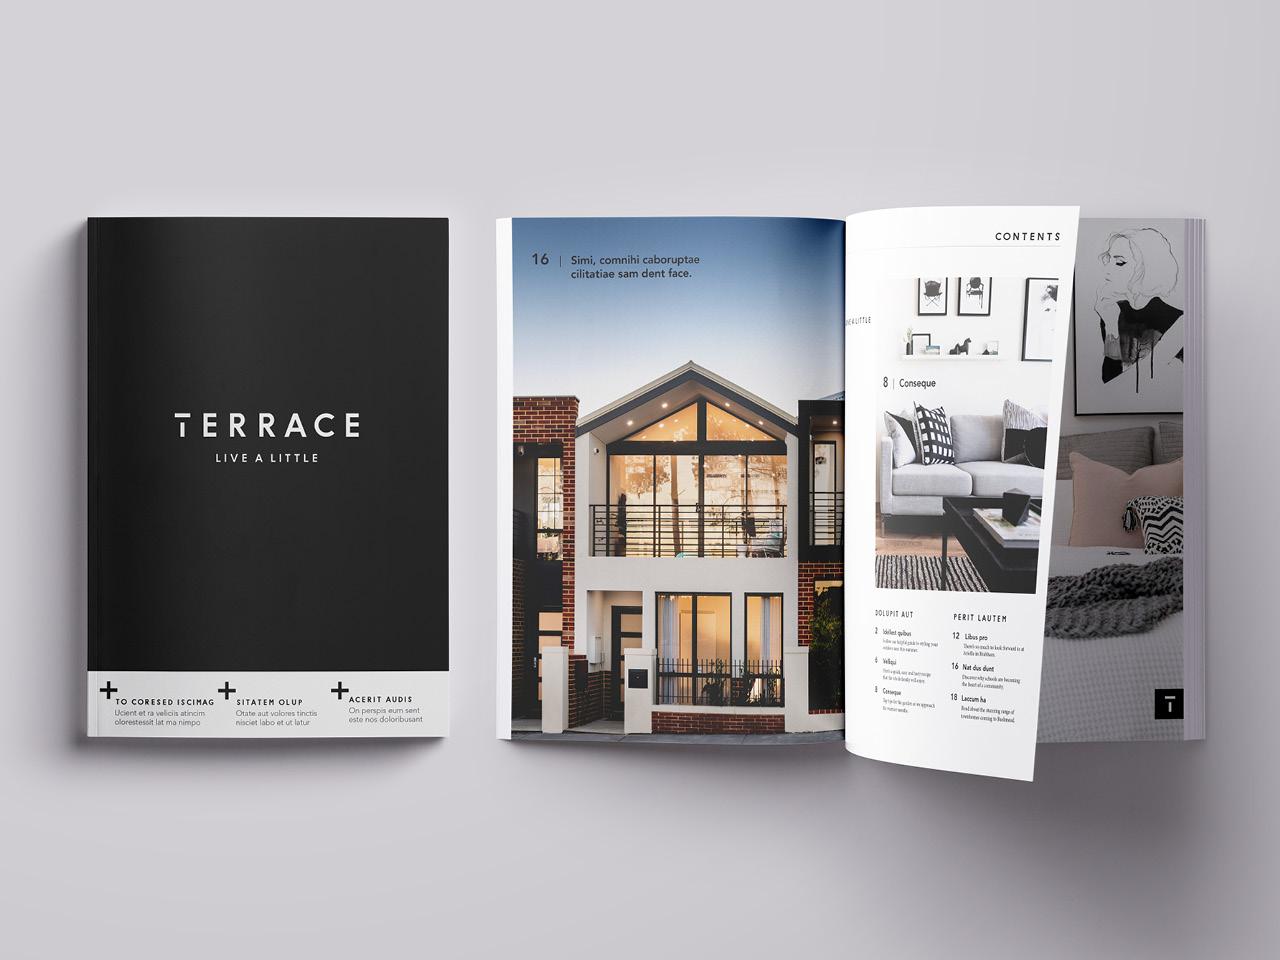 TERRACE IMAGES16.jpg